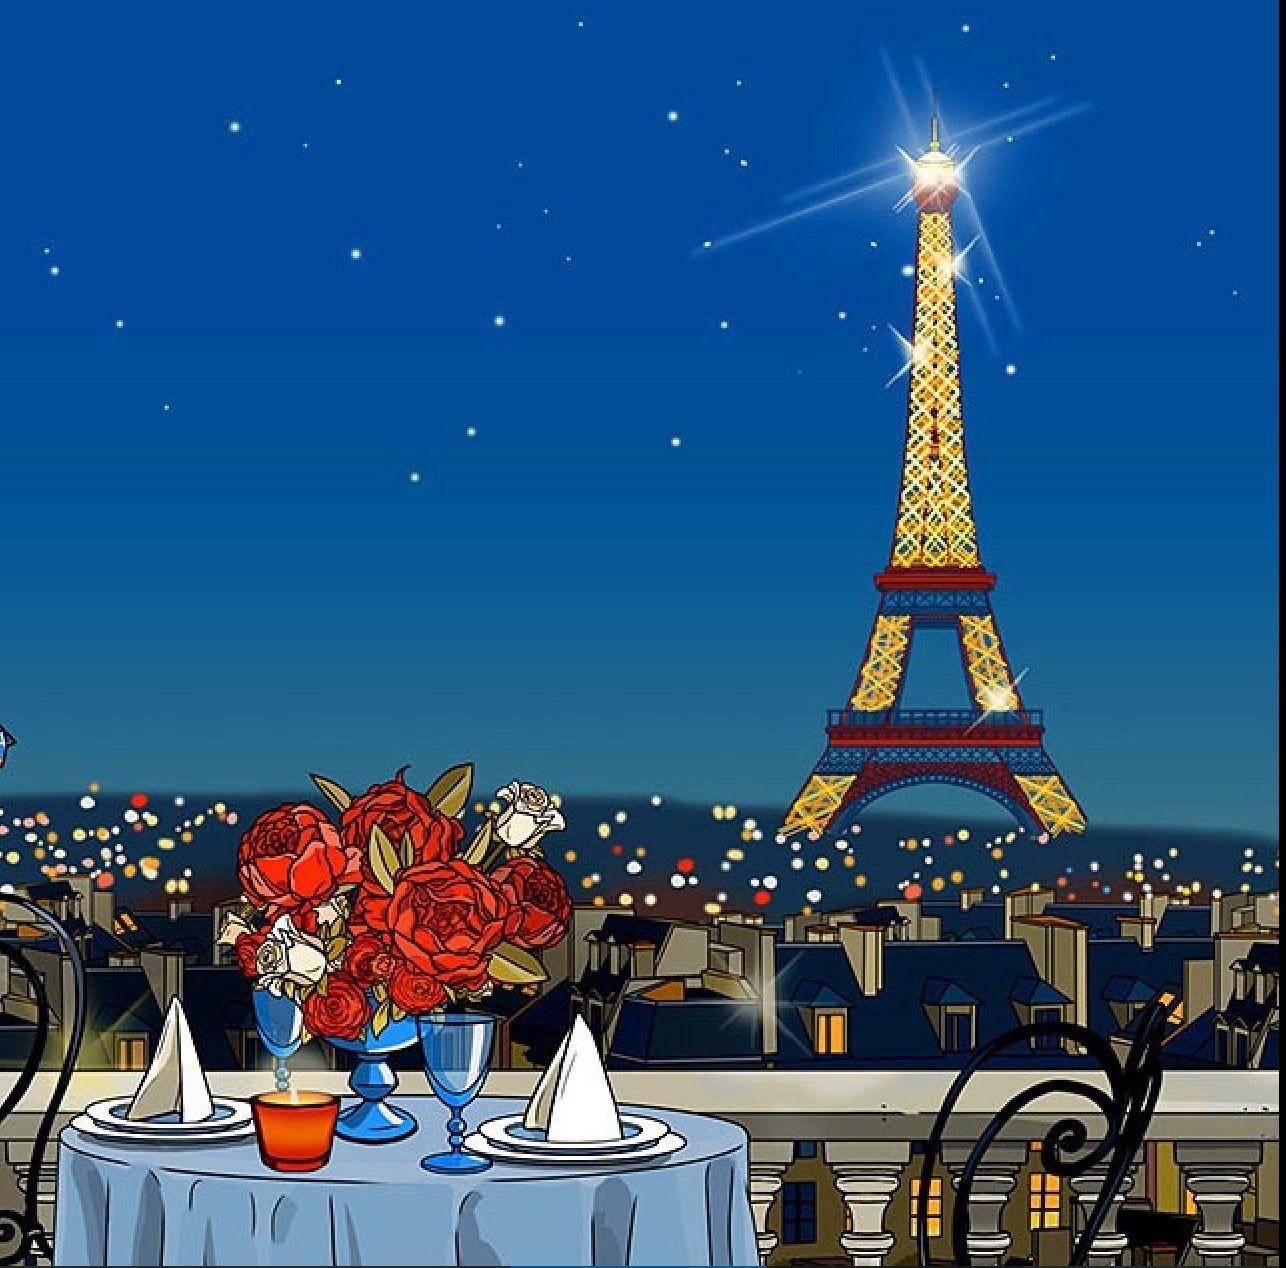 Love This Paris Illustration By Lazarevaillustration